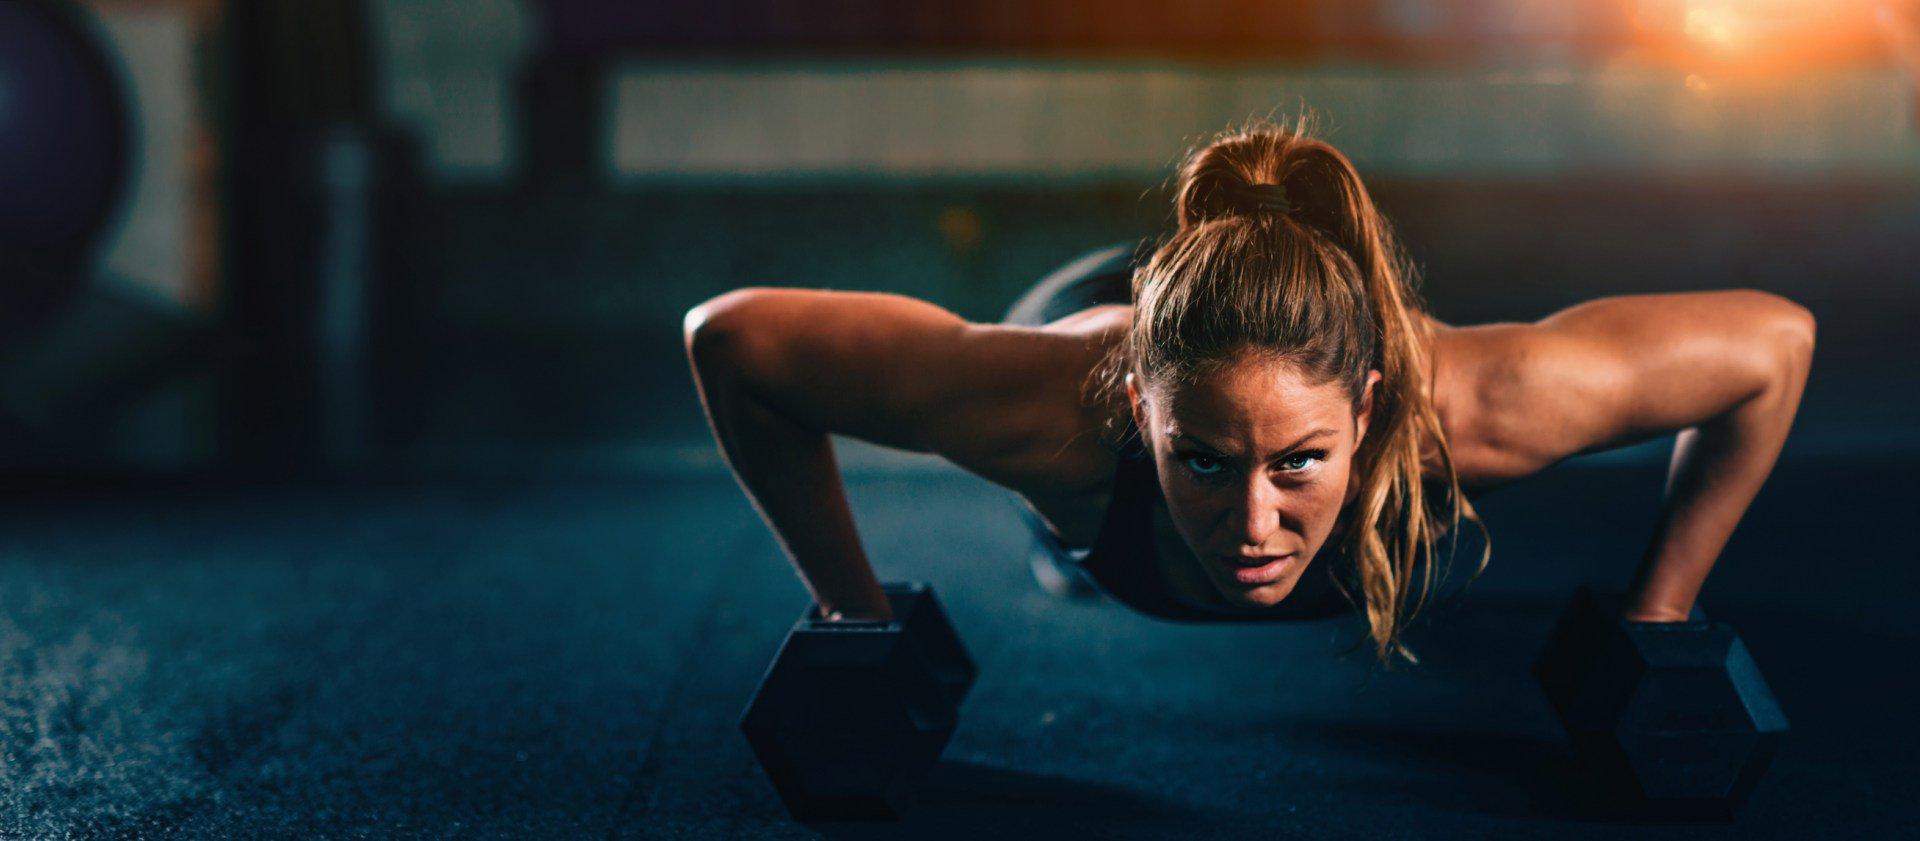 Personal trainer en Fitness opleidingen - Sport & People